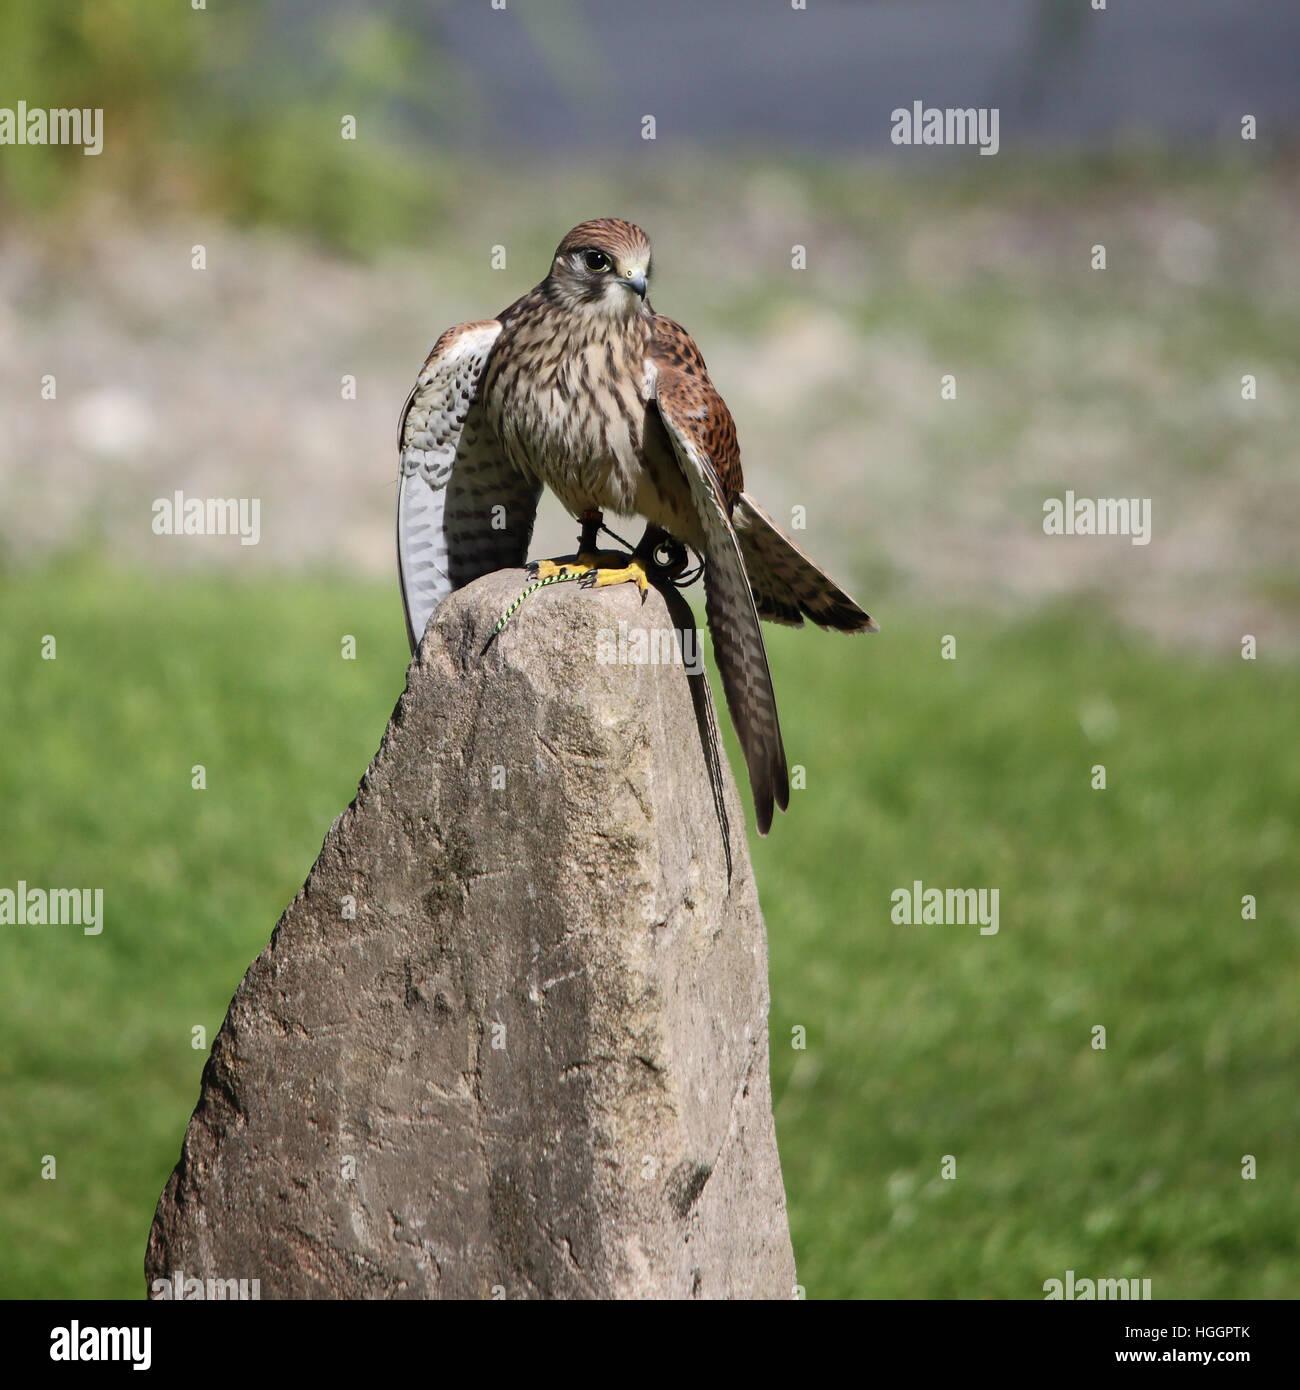 Common Kestrel, also known as European Kestrel, Eurasian Kestrel, Old World Kestrel or simply Kestrel perched on - Stock Image